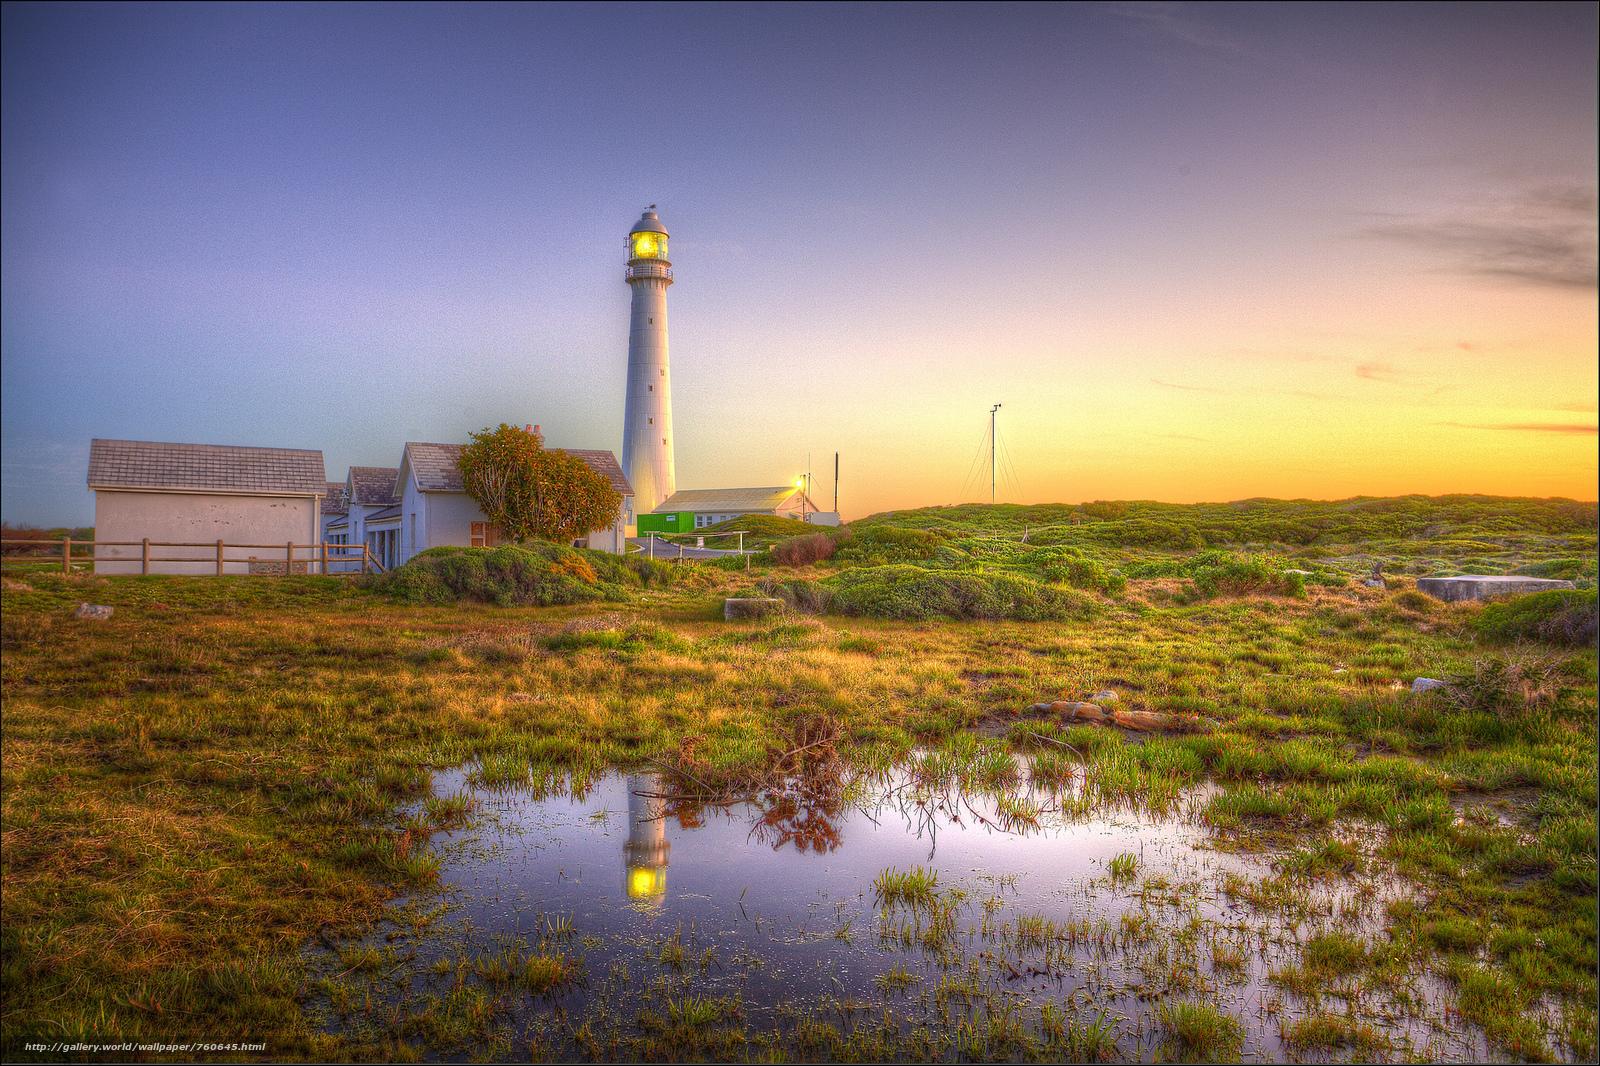 Slangkop Lighthouse, Kommetjie, Lighthouse Slangop, Cap-Peninsula, South Africa, sunset, landscape